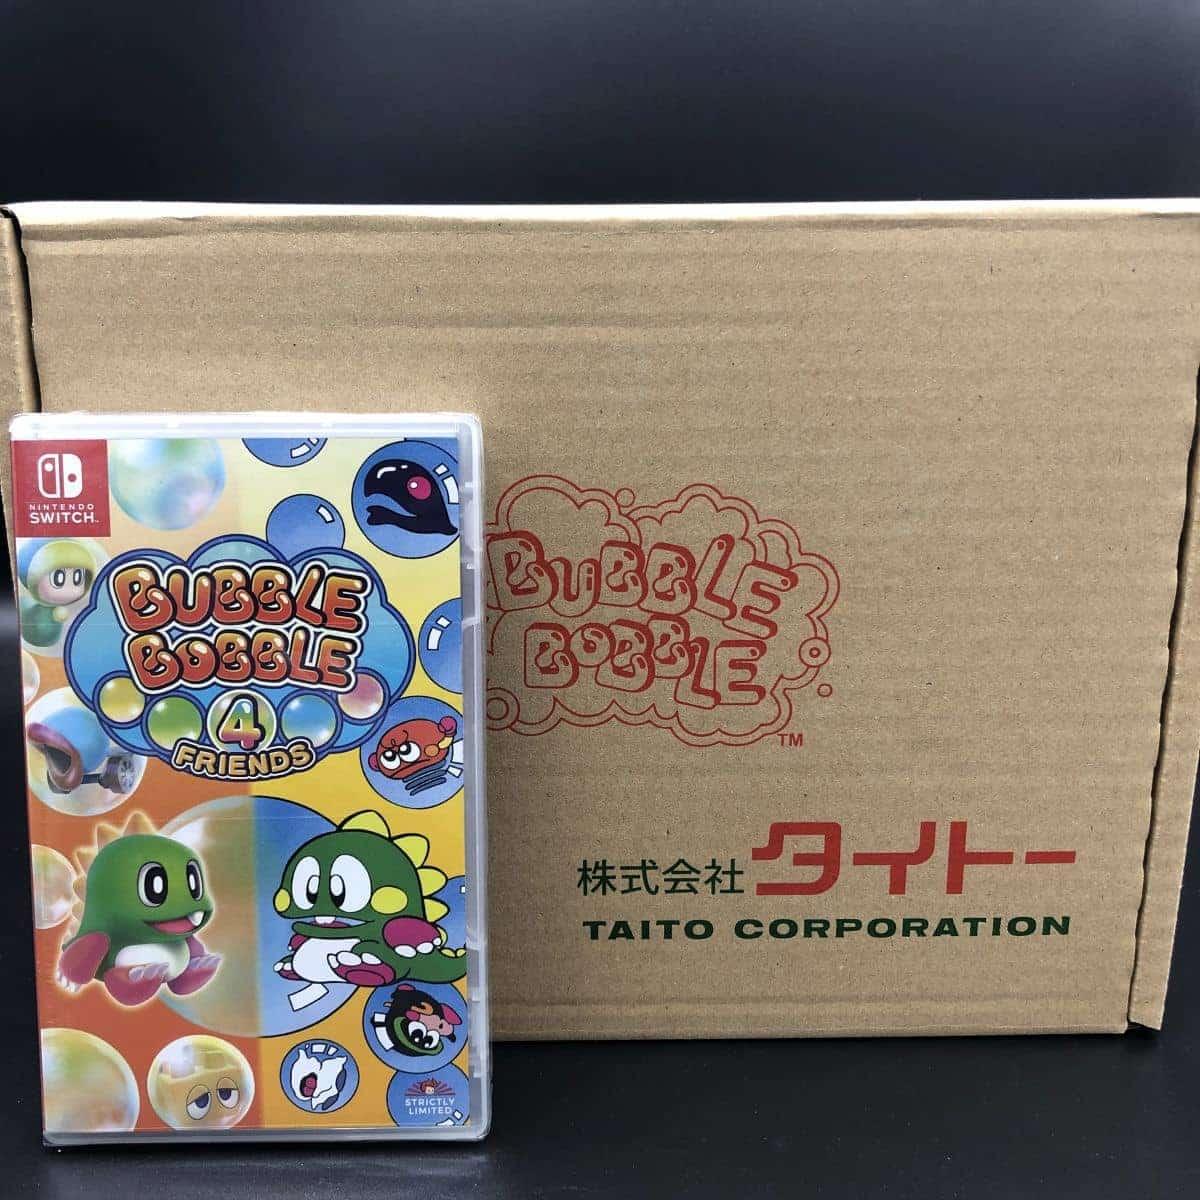 Bubble Bobble 4 Friends (Collector's Edition) (NEU) Nintendo Switch